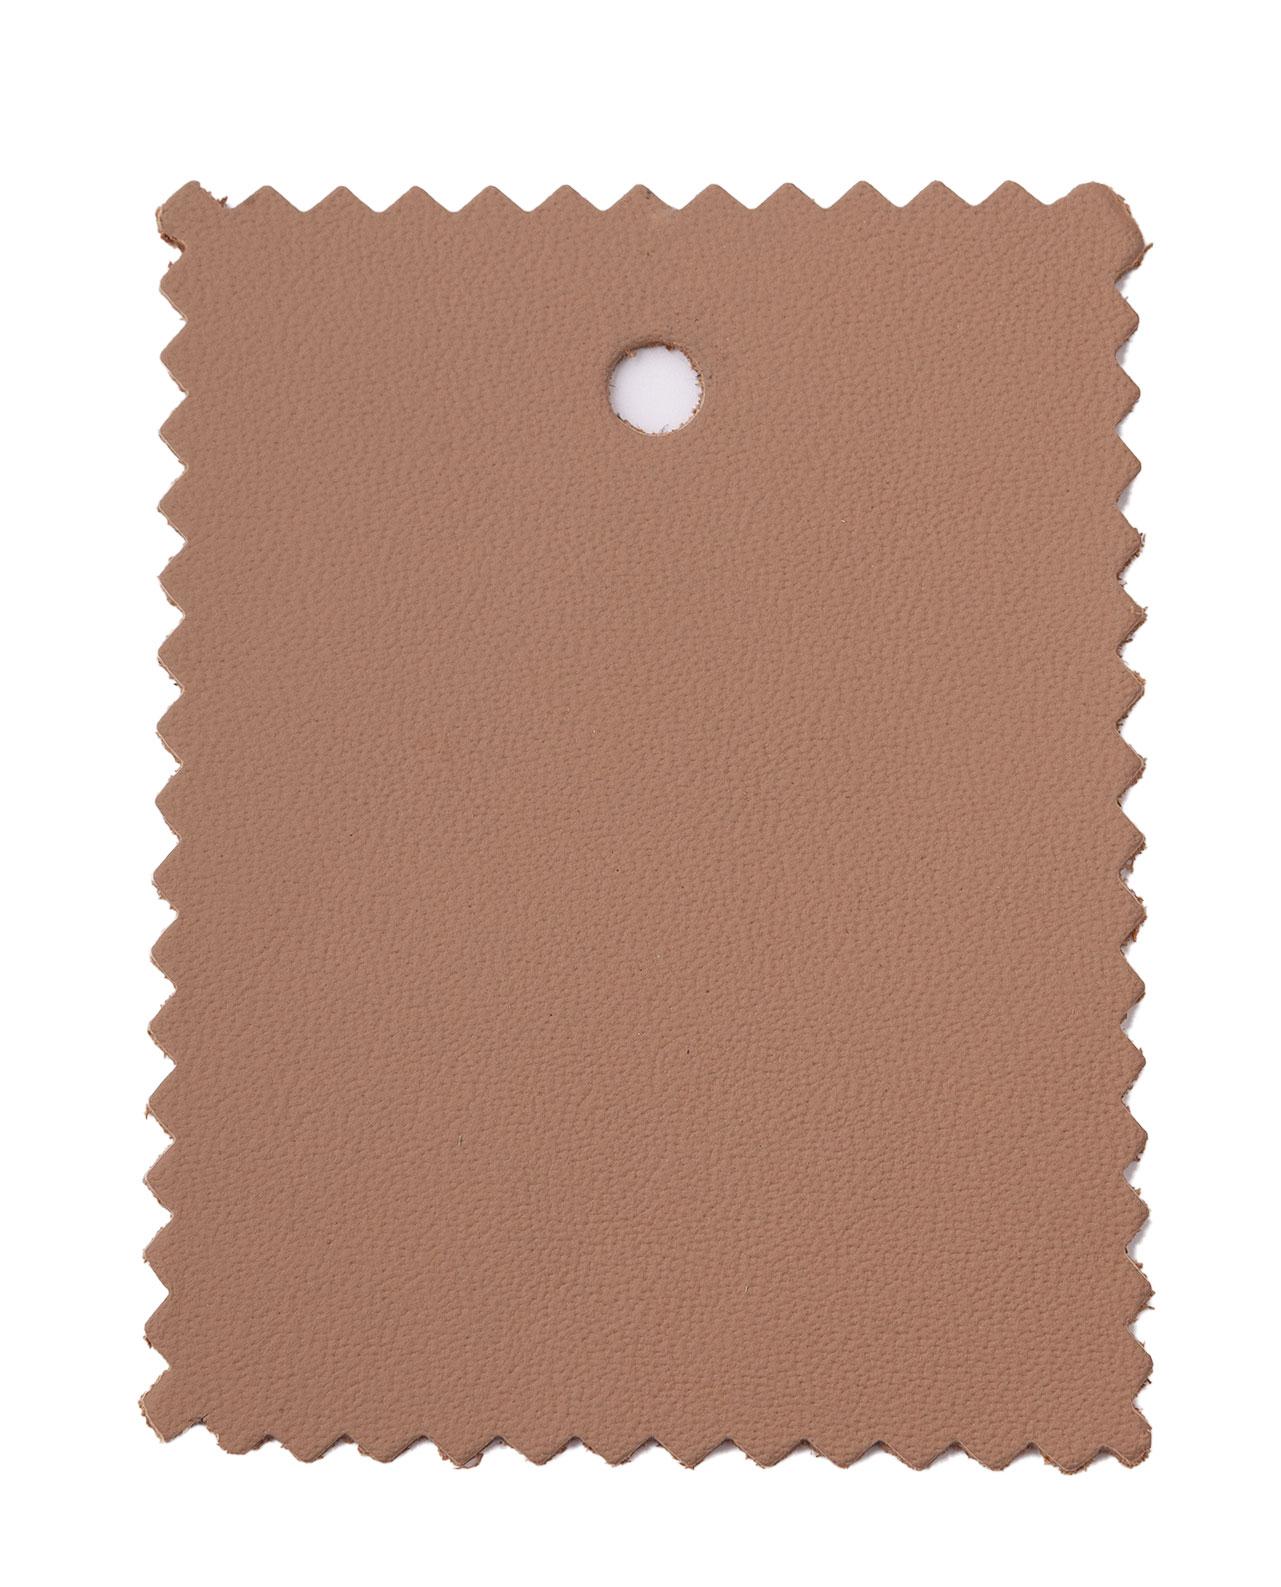 Abbildung porsche-nappa-mojave-beige